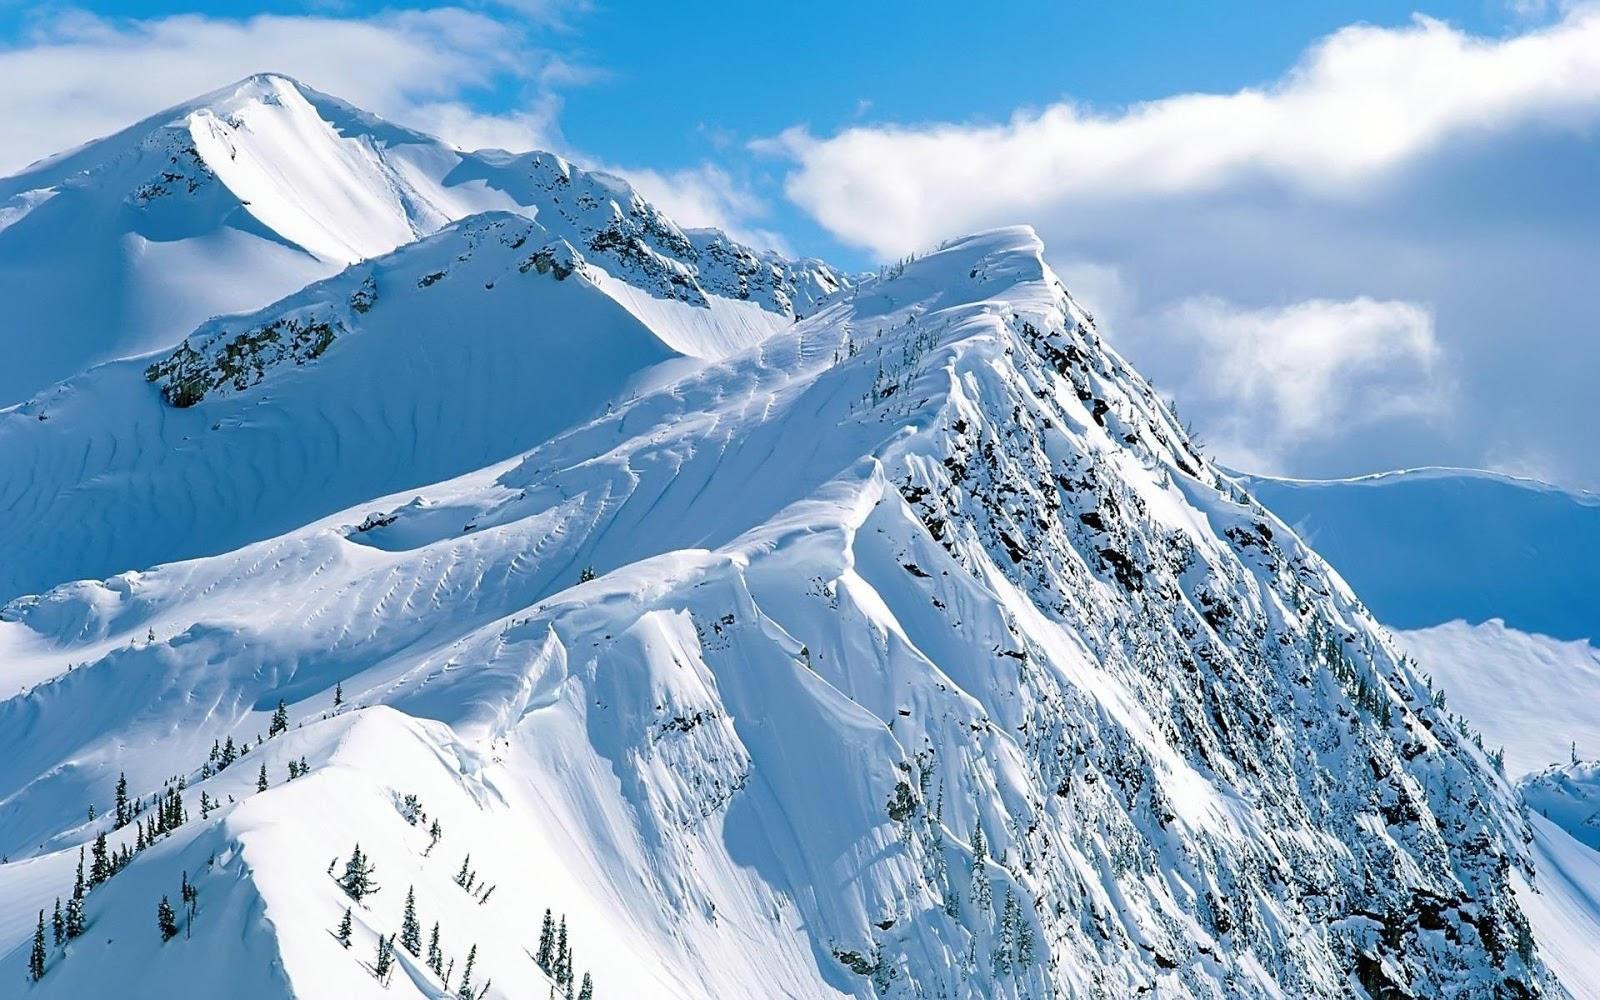 Must see Wallpaper Mountain Windows 10 - axYqh4  Pic_568962.jpg